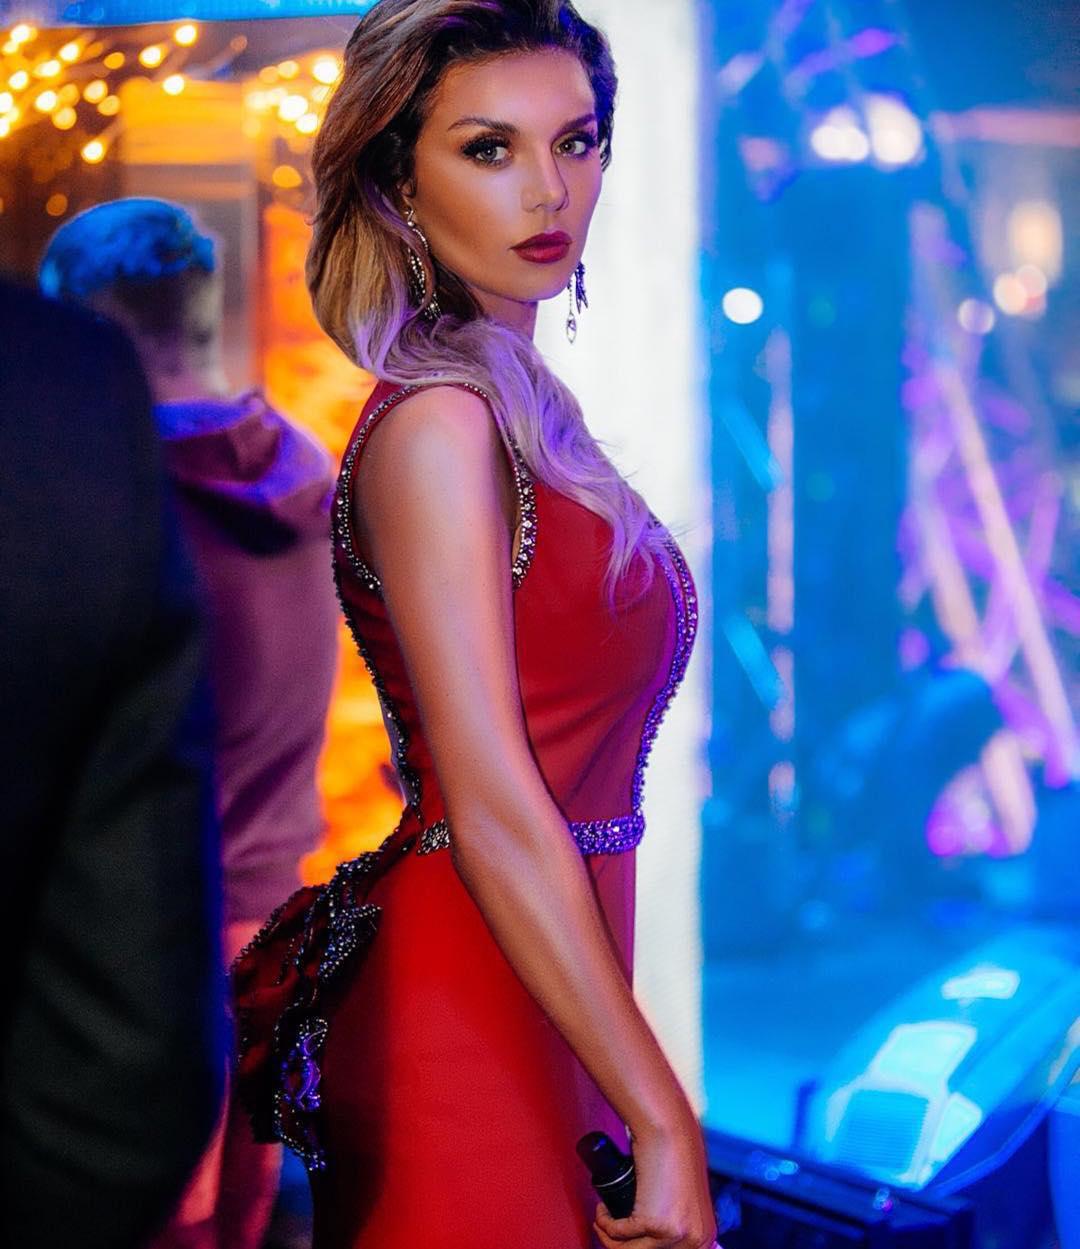 Украинская певица Анна Седокова